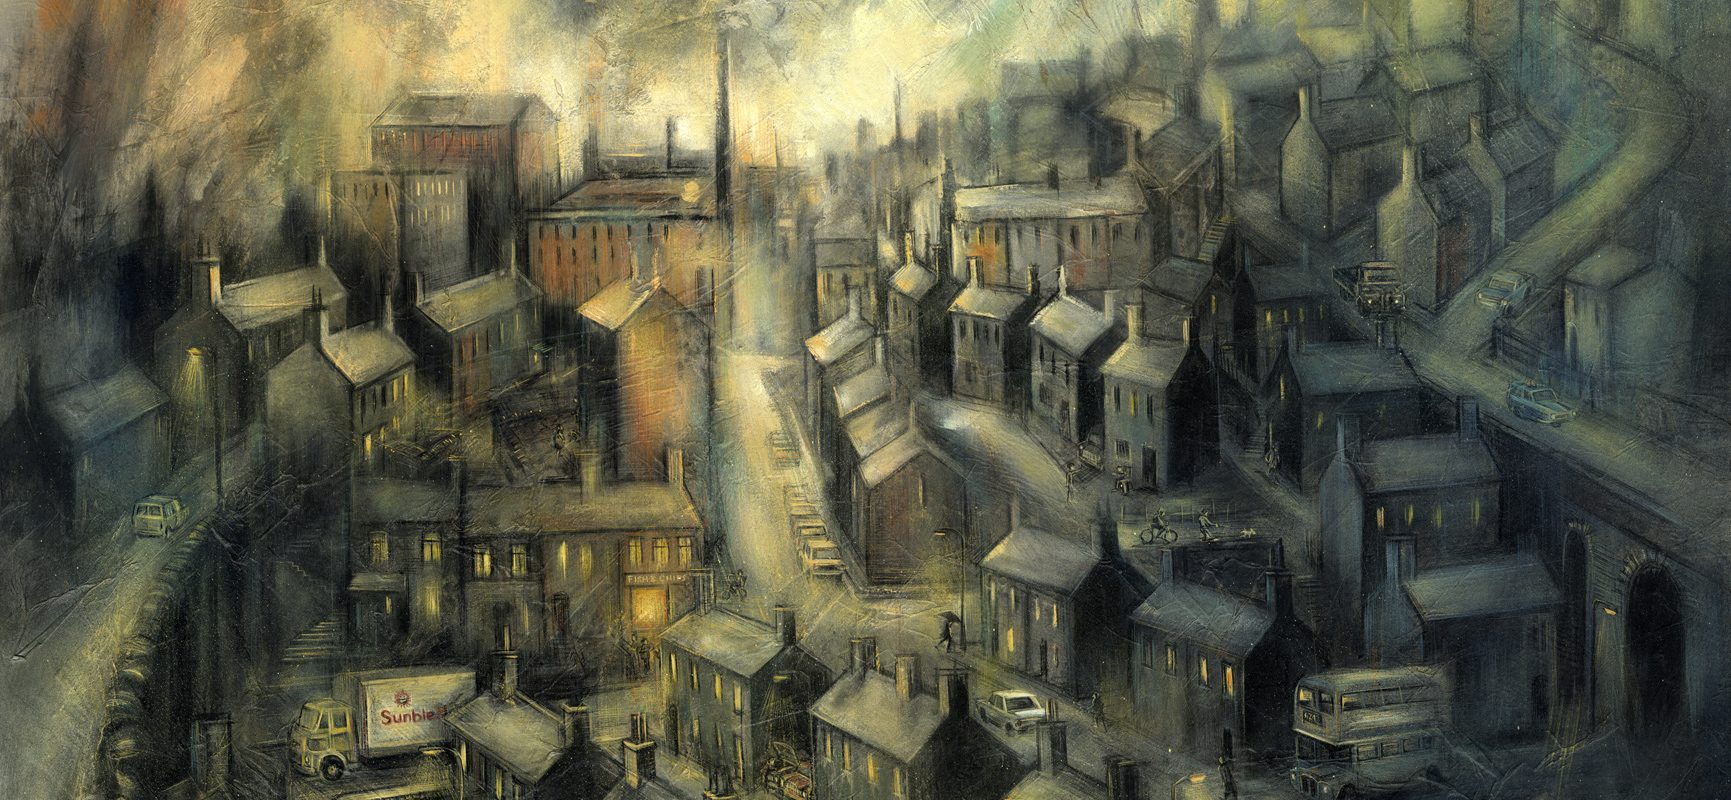 Original-craig-everett-paintings-for-sale